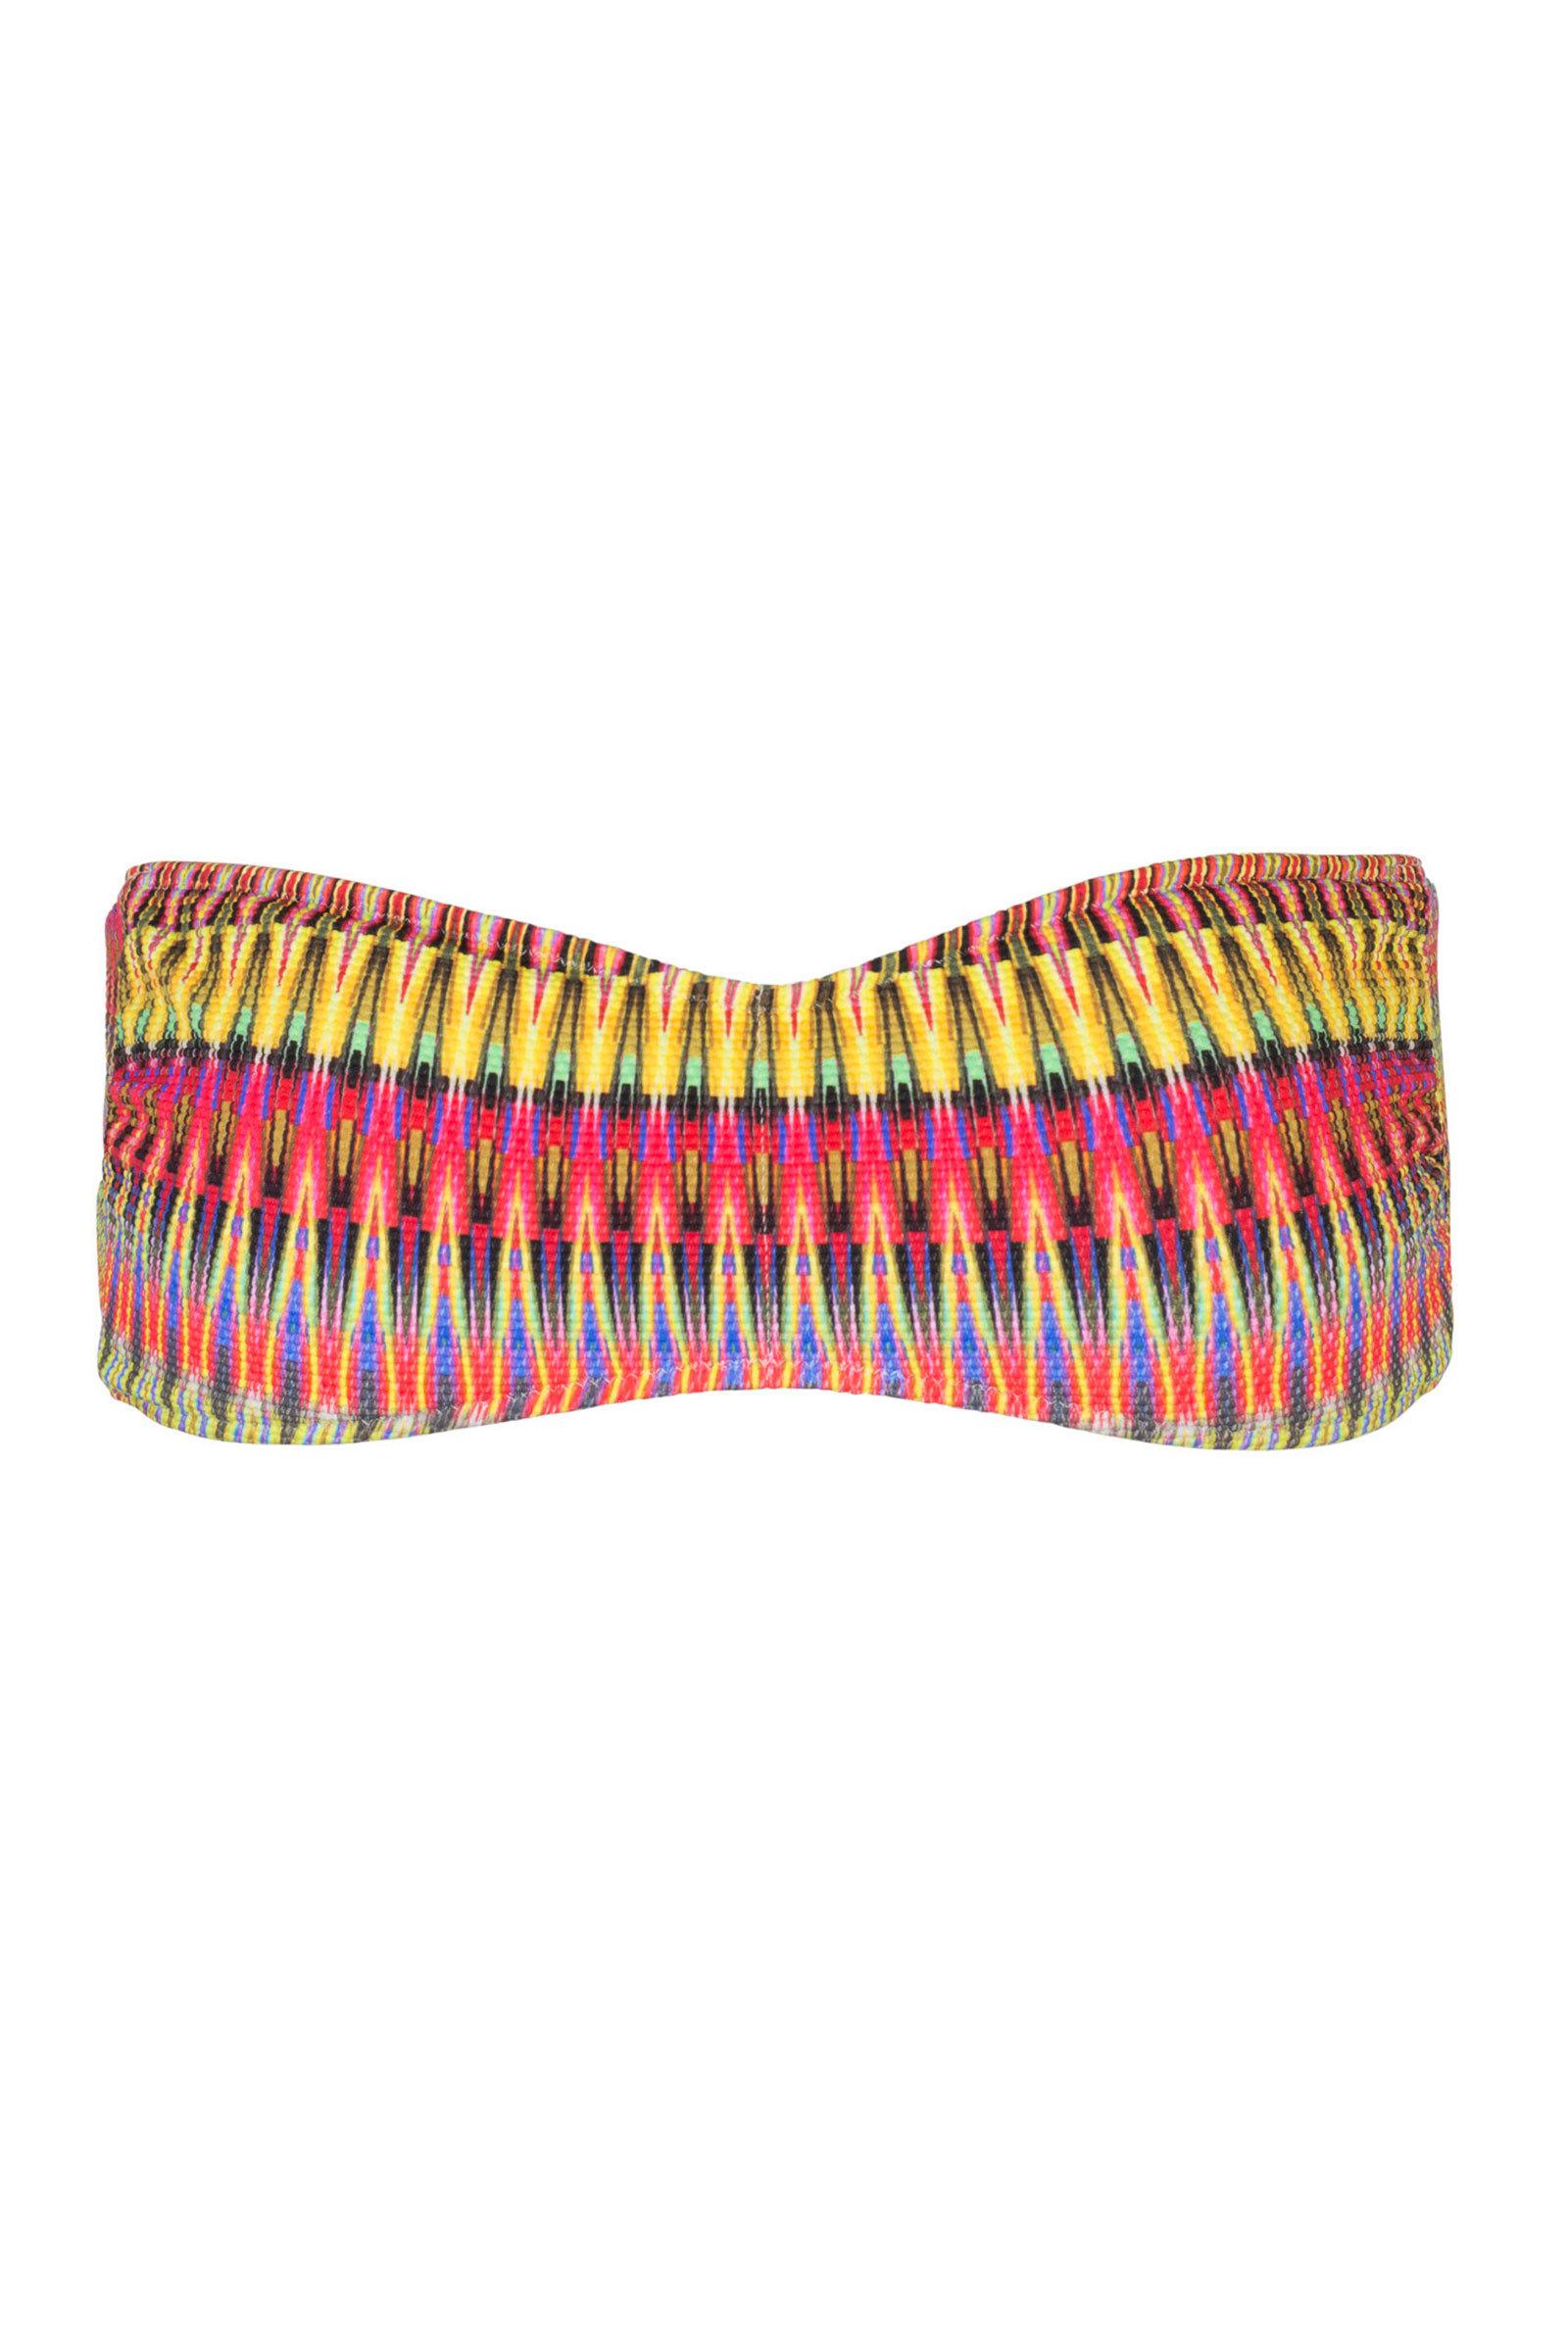 VALIMAR Salinas Bandeau Bikini Top Multi-Colour